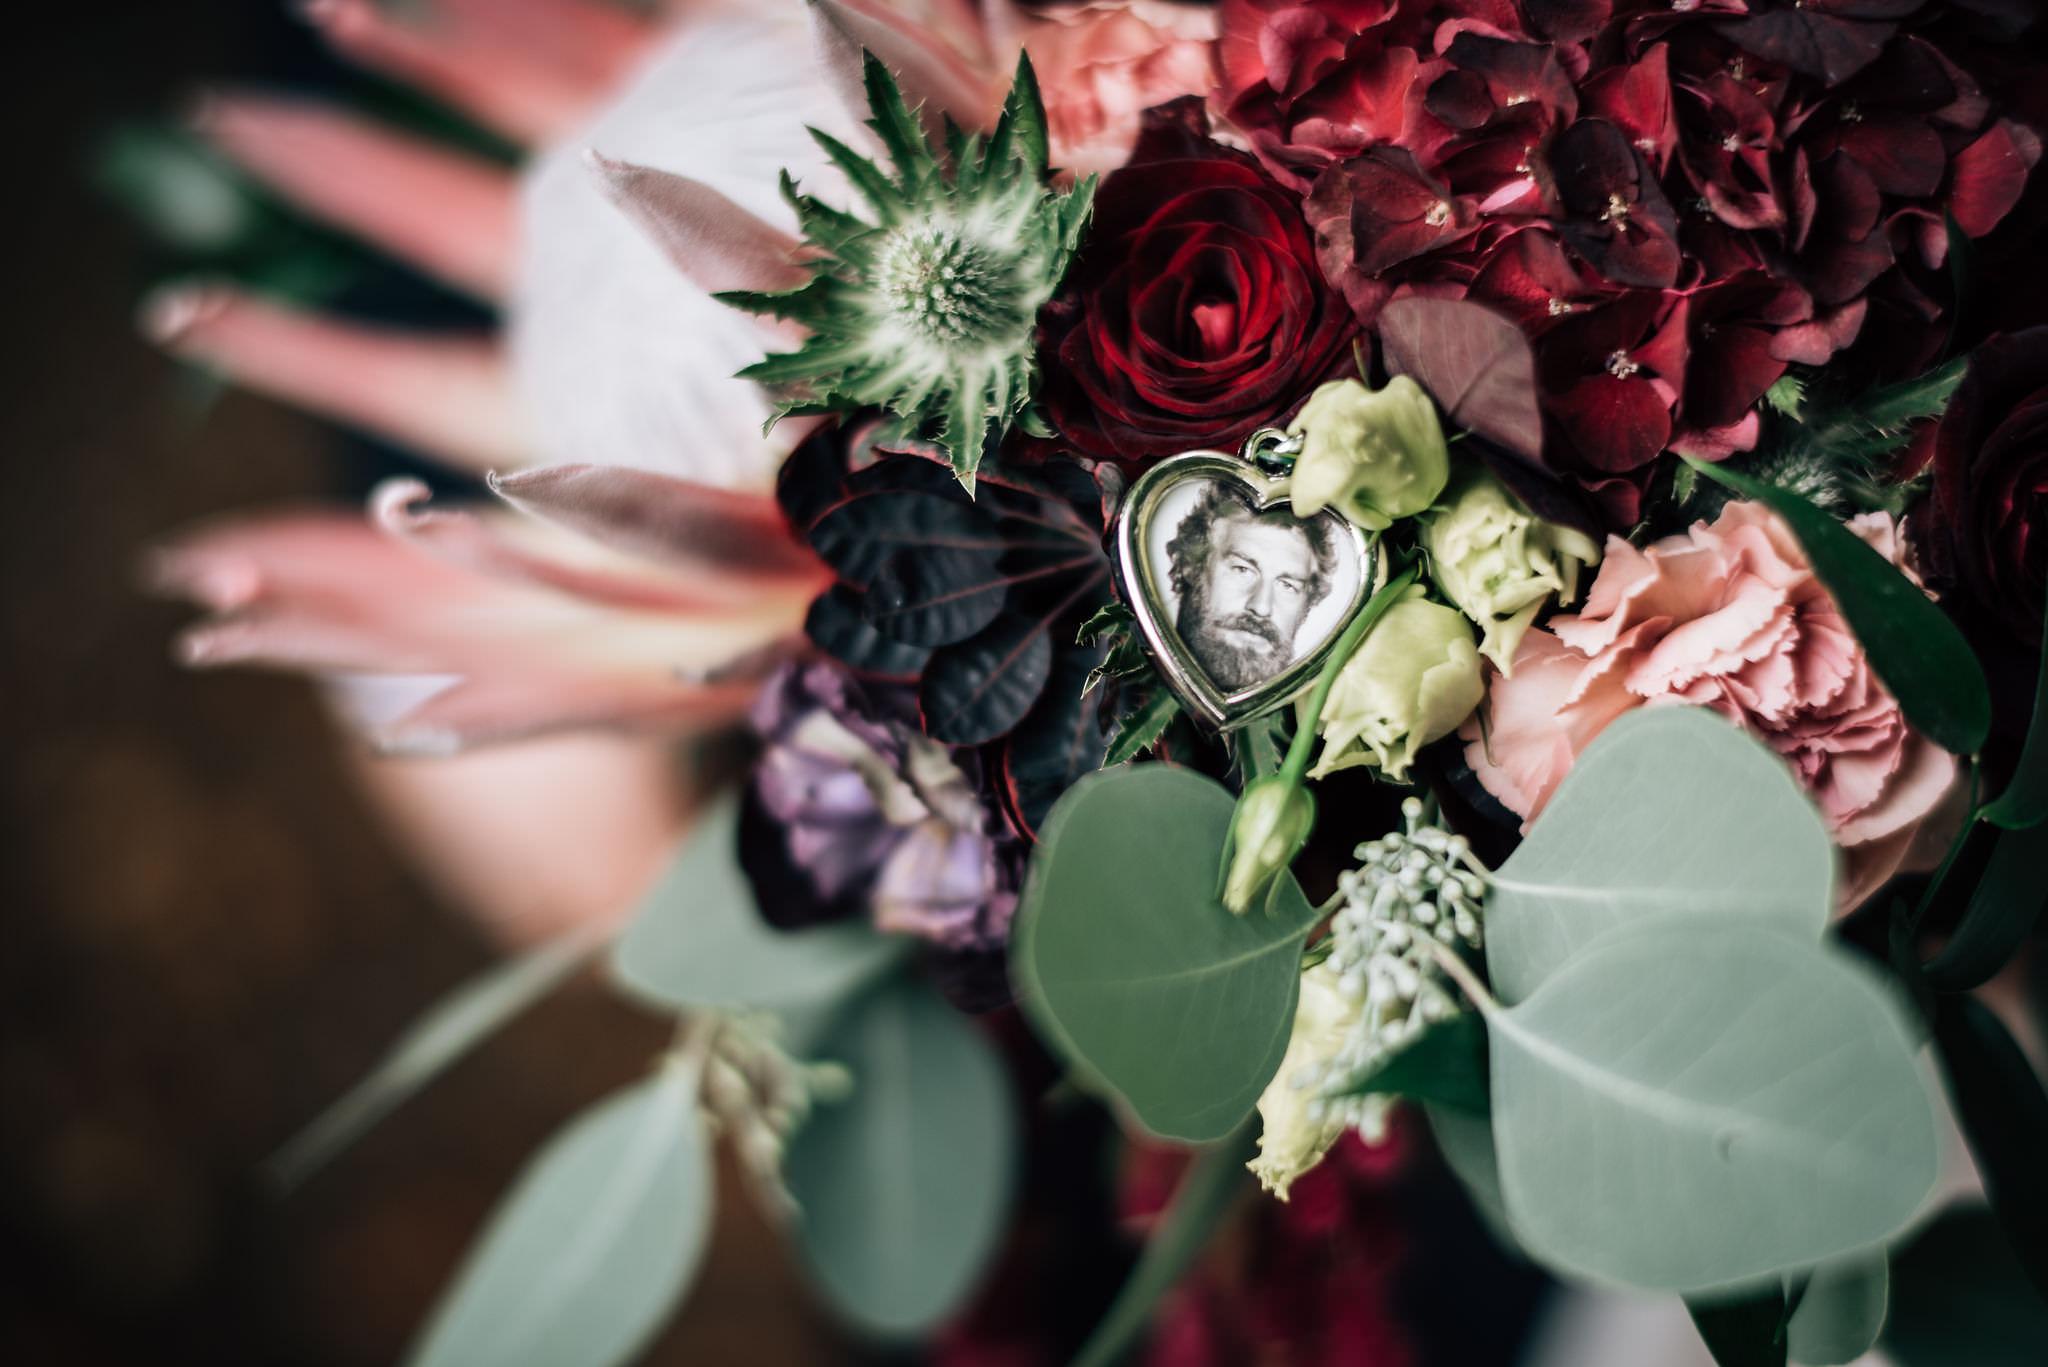 LMV_0231_fotografering_larvik_bryllup_aspargesgarden_.jpg